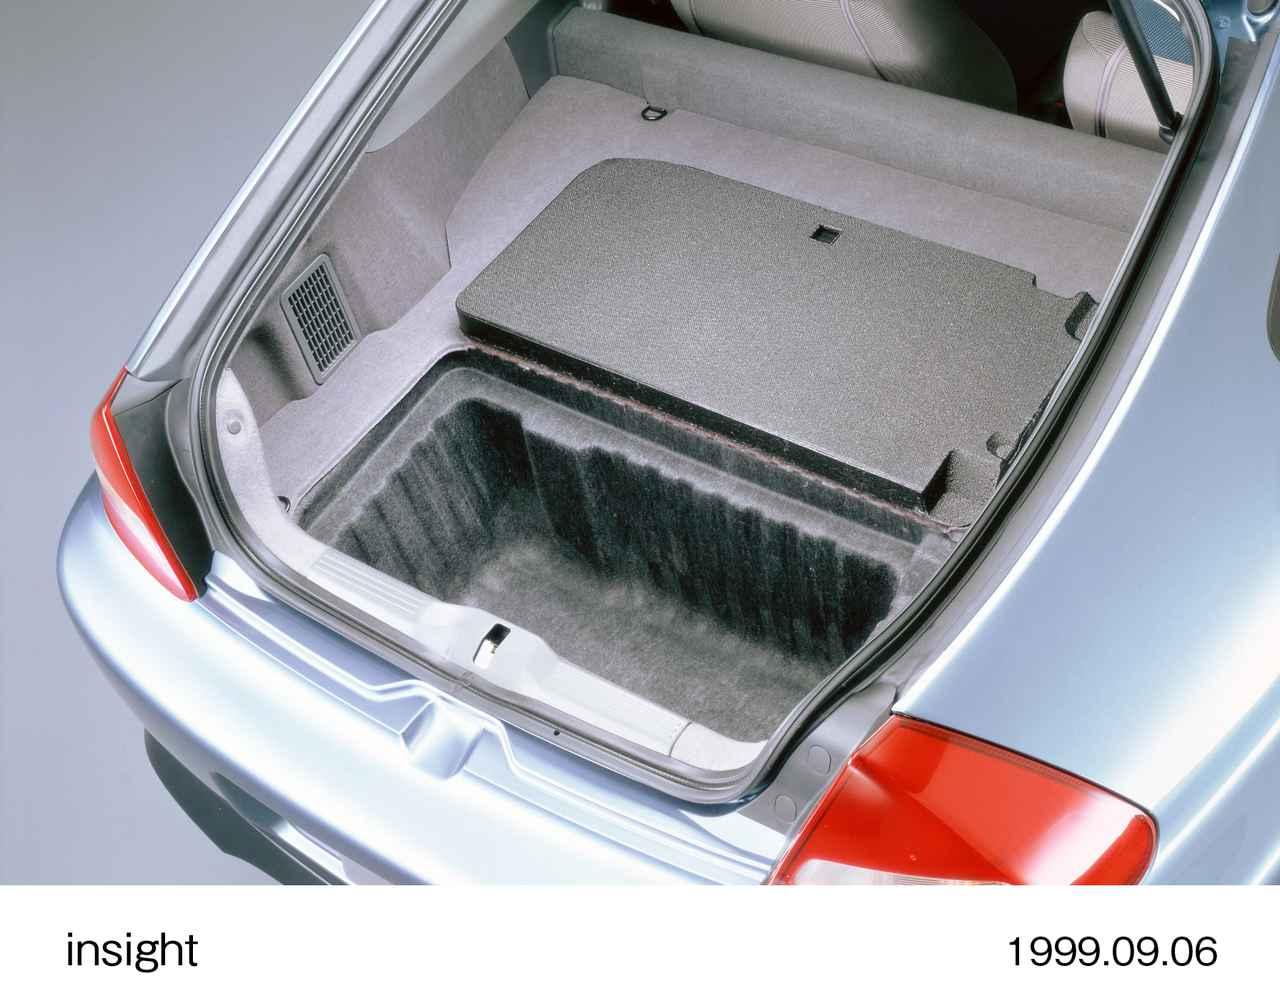 Images : 6番目の画像 - ホンダインサイト関連の画像はこちら(クリックして拡大) - A Little Honda | ア・リトル・ホンダ(リトホン)